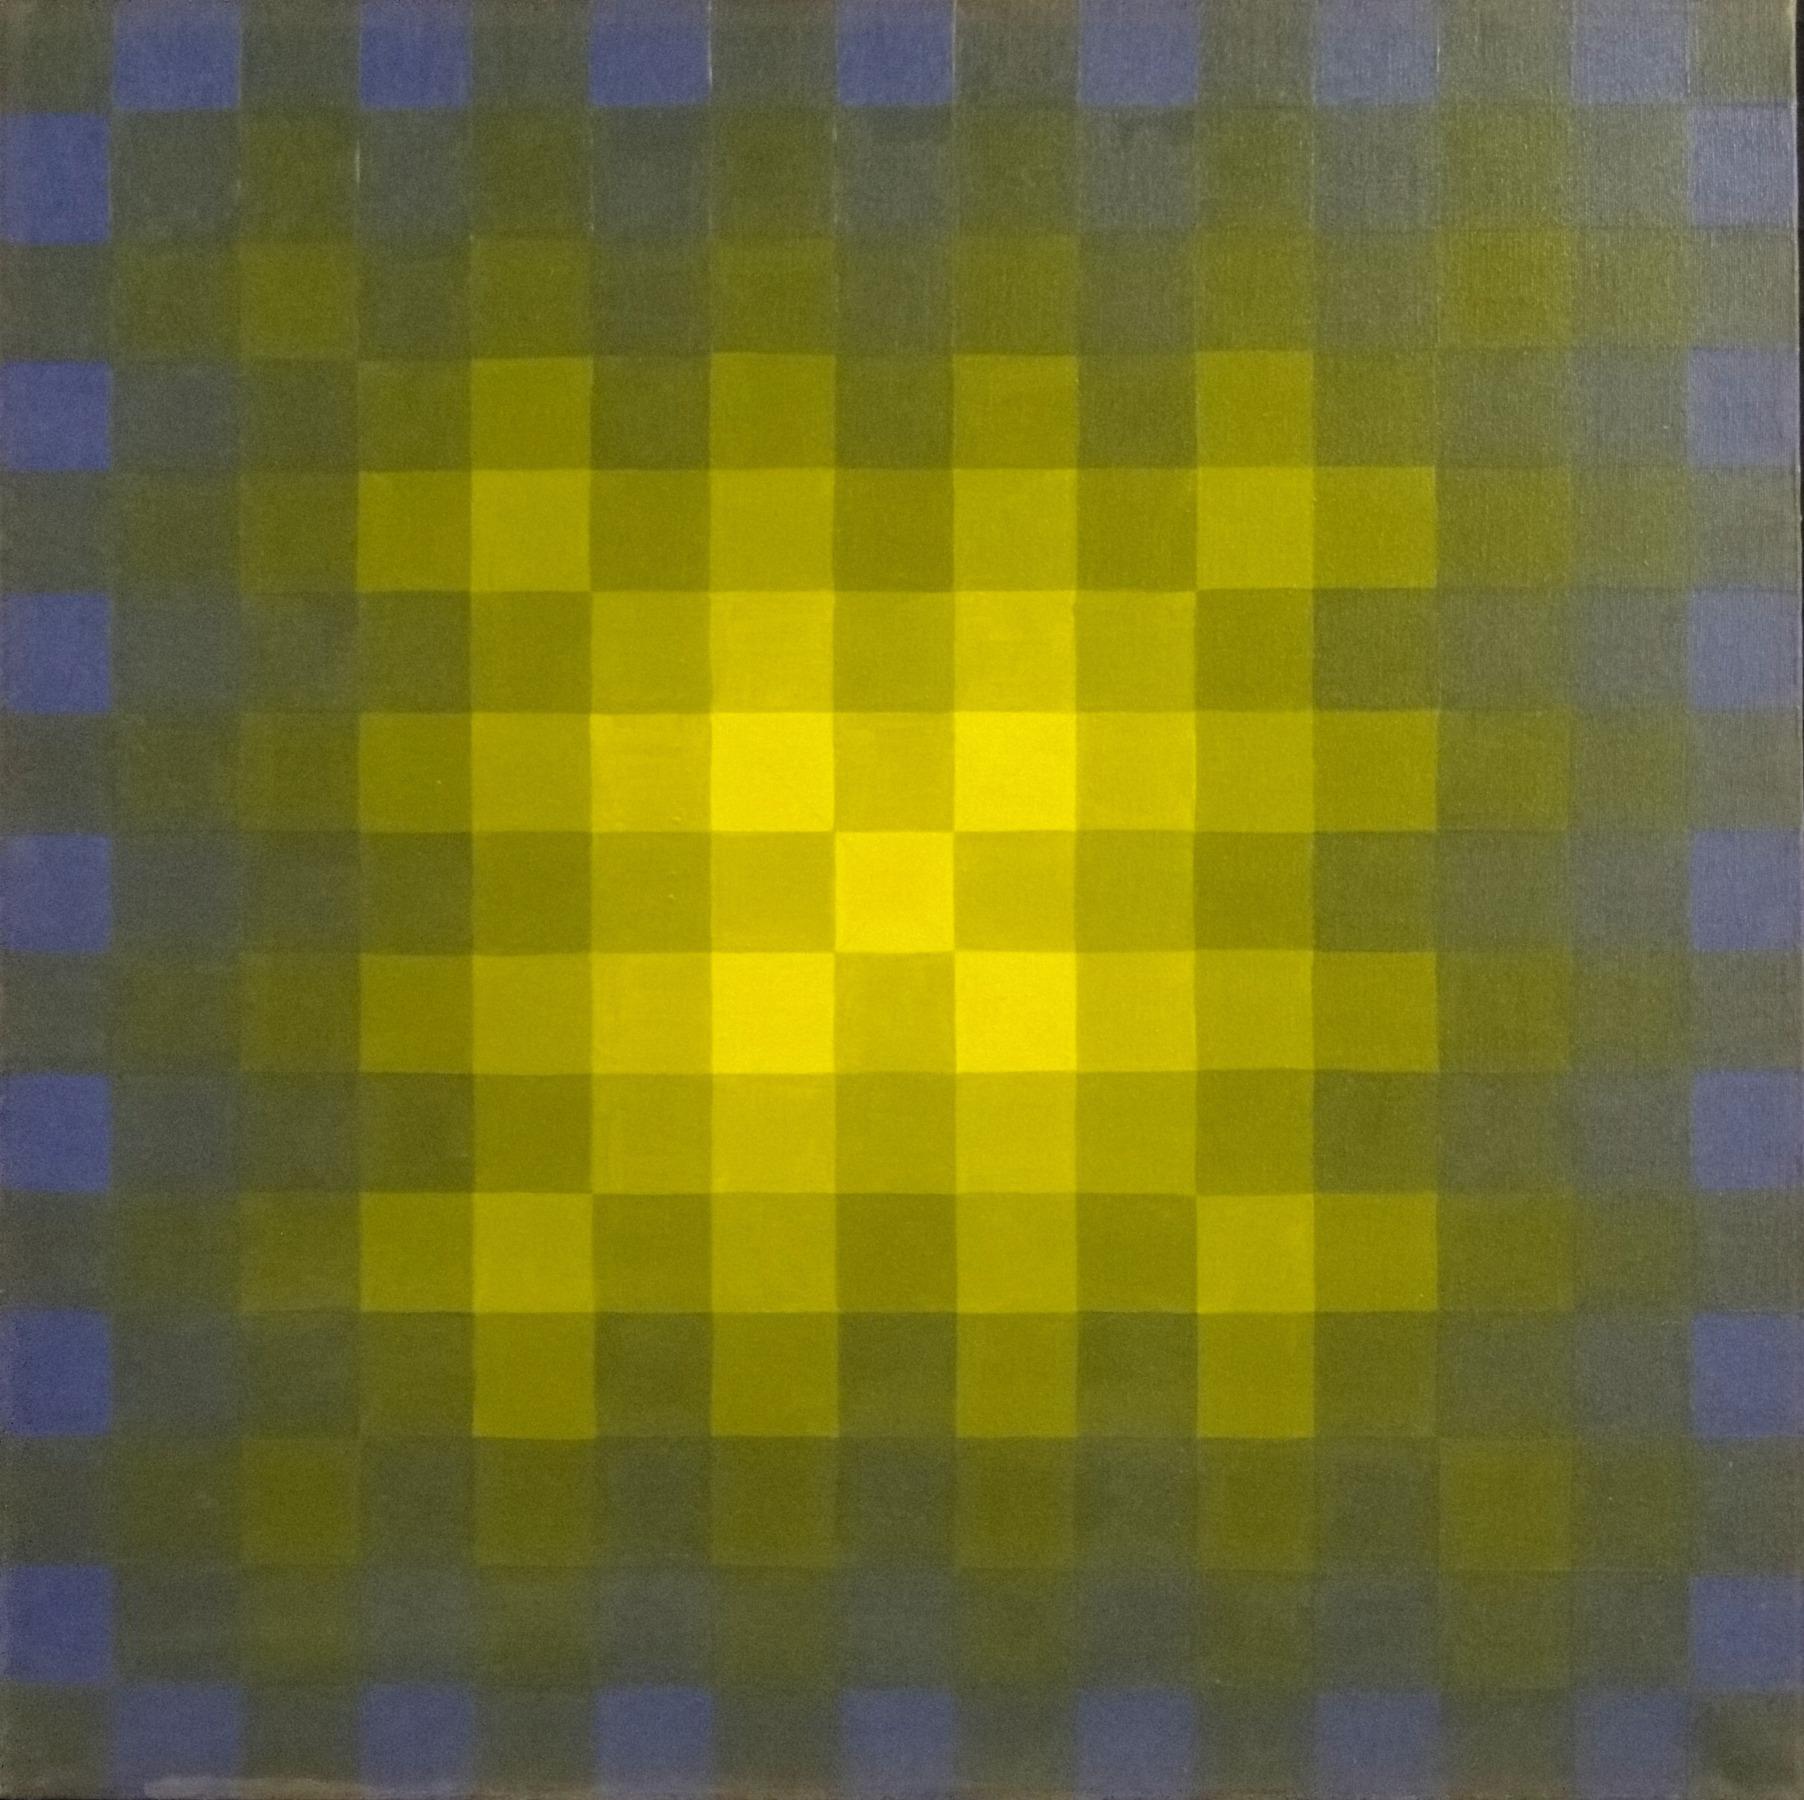 63a9daebf3b0a14e4e17__5__Five_Pieces_of_Gold__Oil___24x24_Chromatic_Structuralism__300_dpi__David_John_Rush.jpg